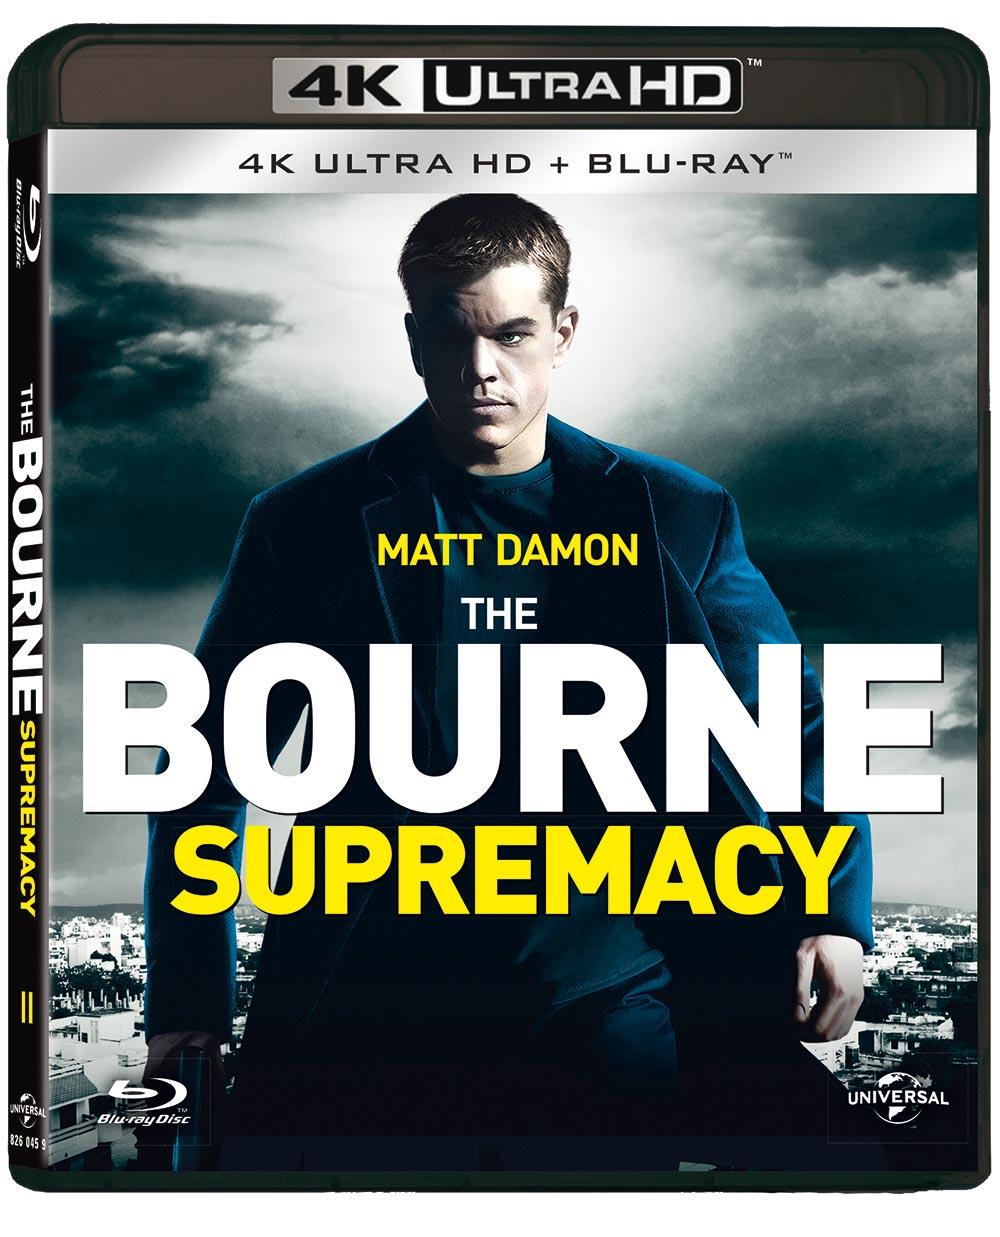 THE BOURNE SUPREMACY (BLU-RAY 4K ULTRA HD+BLU-RAY)